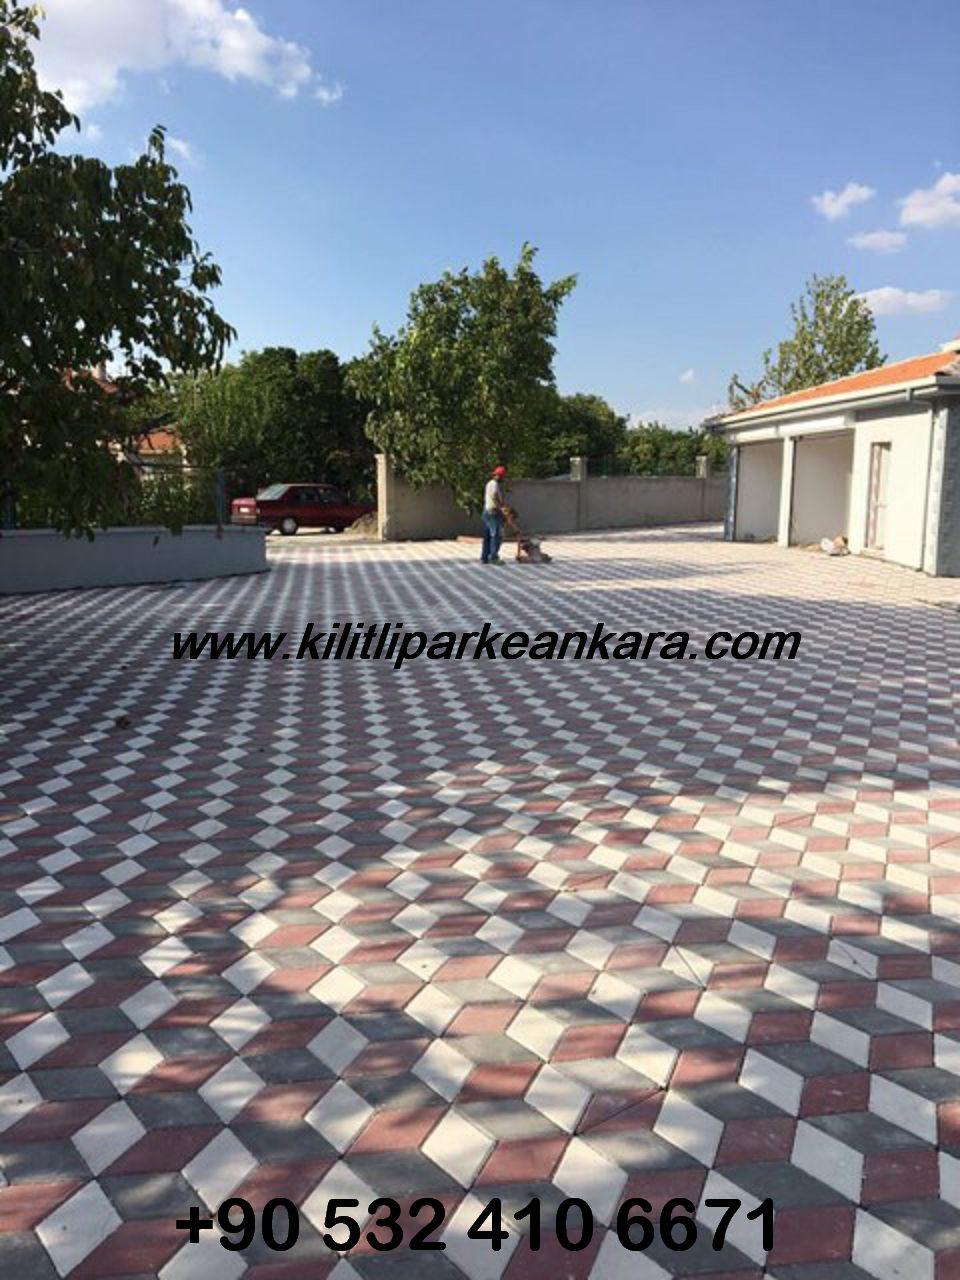 Ankara Kilit Taşı - Kilitli Parke Taşı Ustası (024)